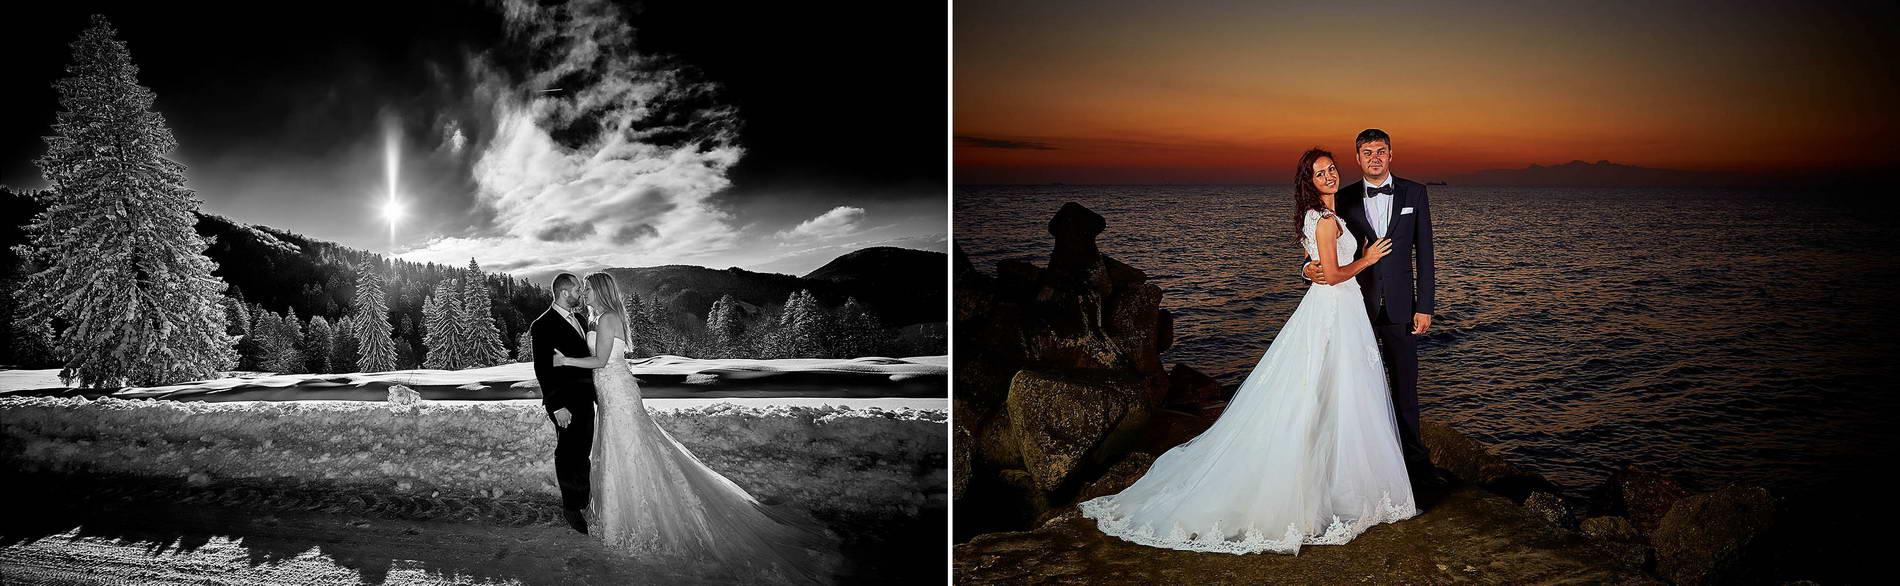 Foto Video Nunta Brasov Servicii Complete De Fotografie Si Filmare Pentru Nunta